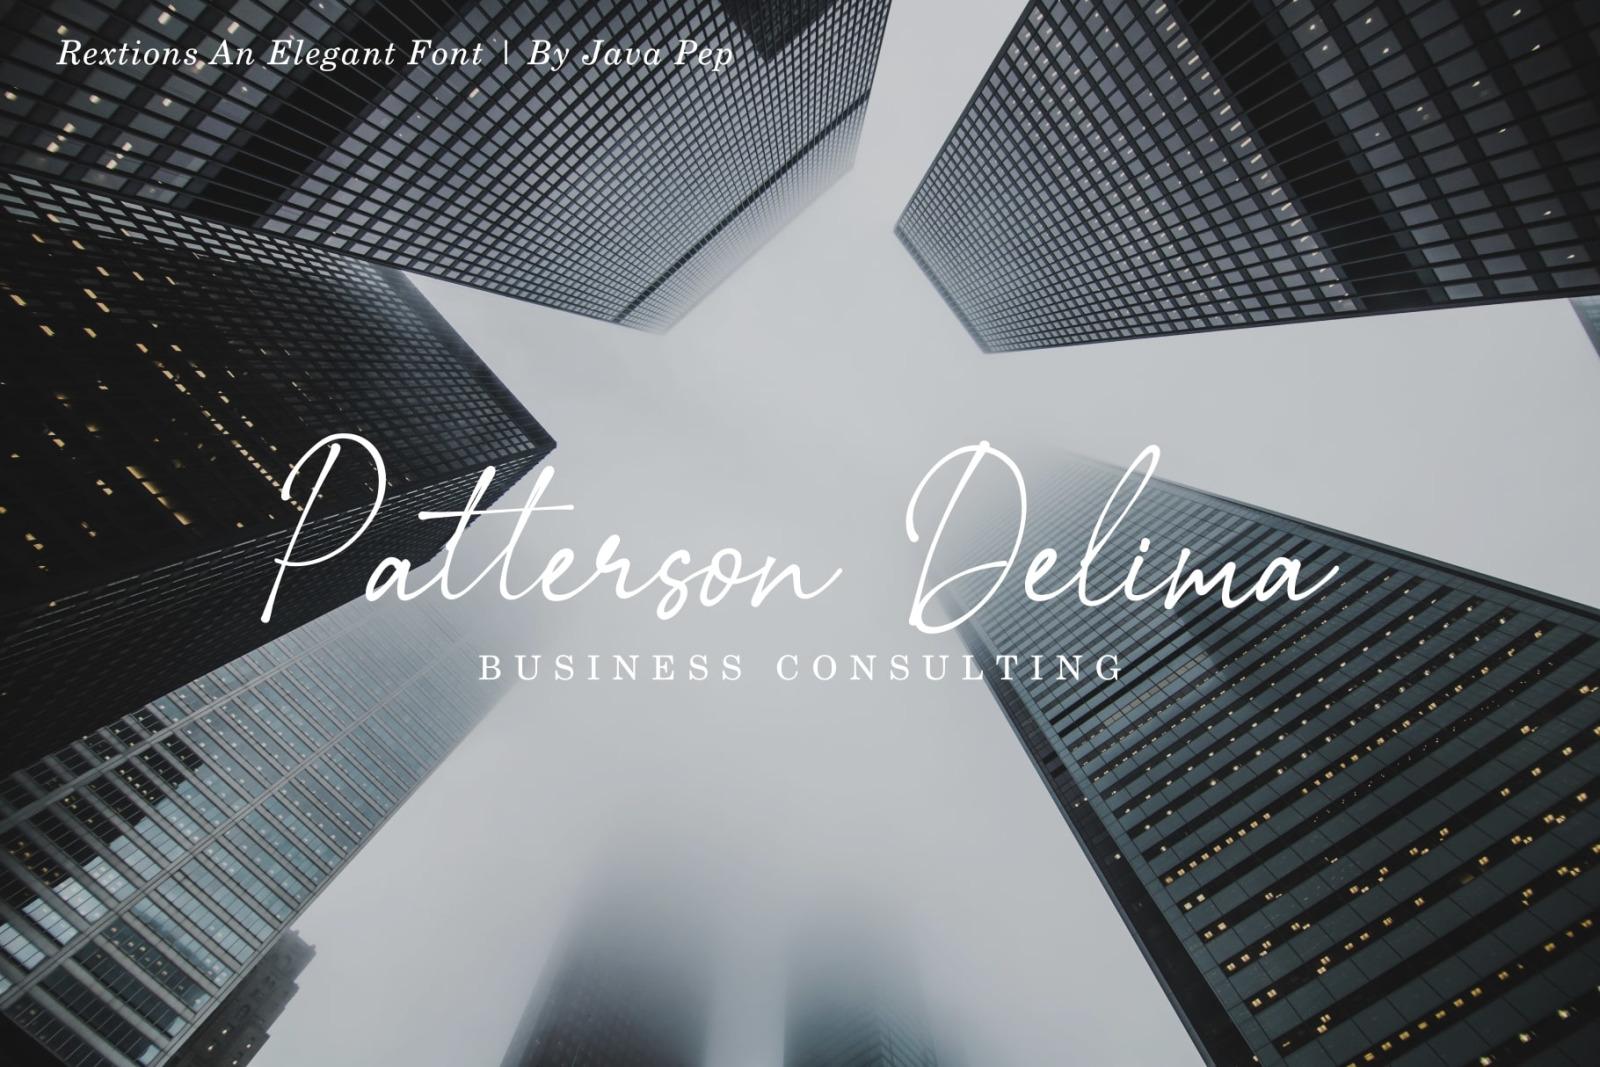 Rextions / an elegant font